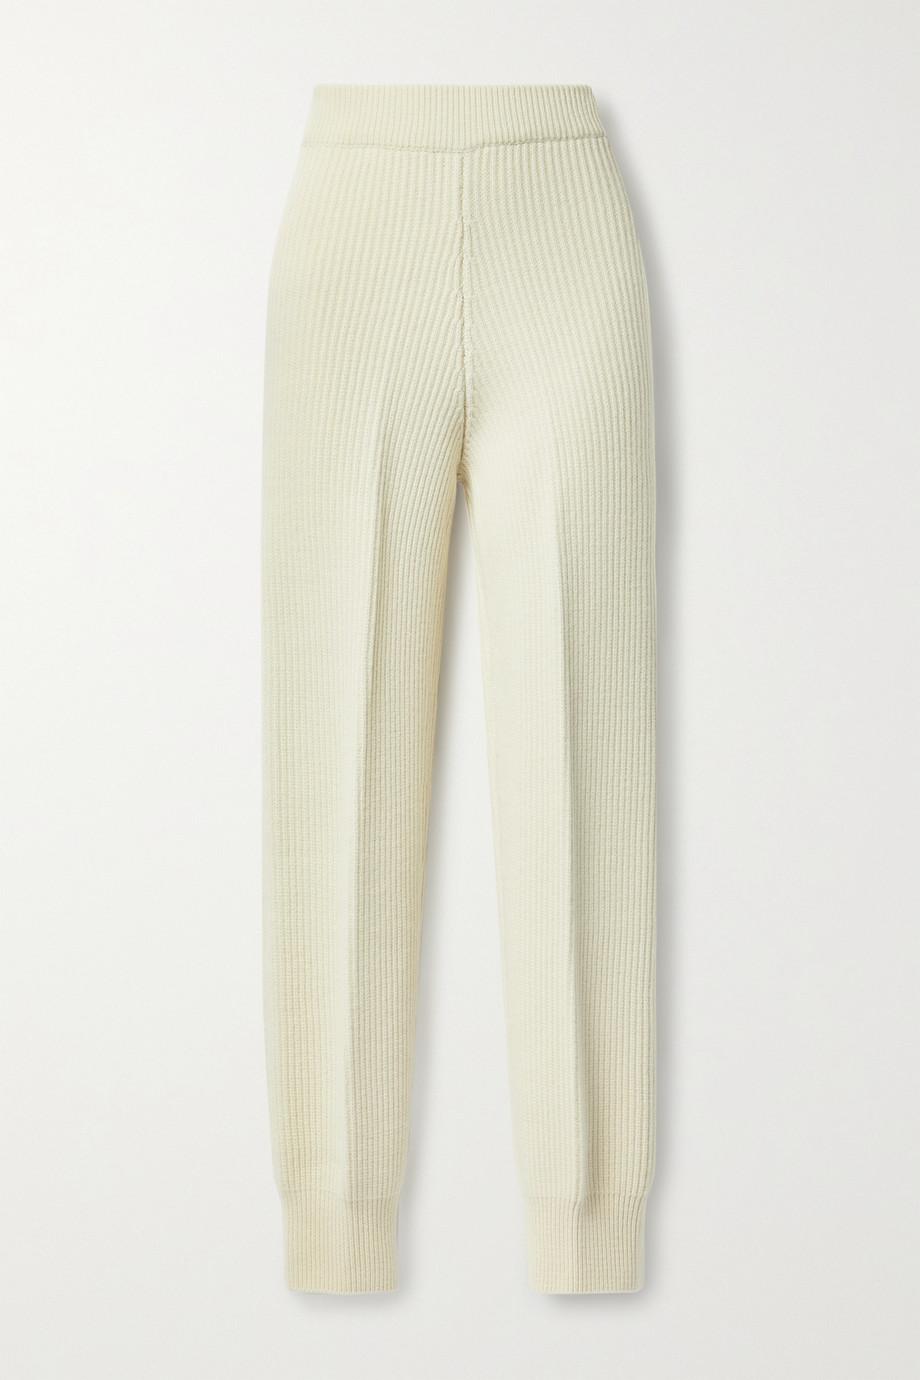 Frankie Shop Ribbed wool track pants